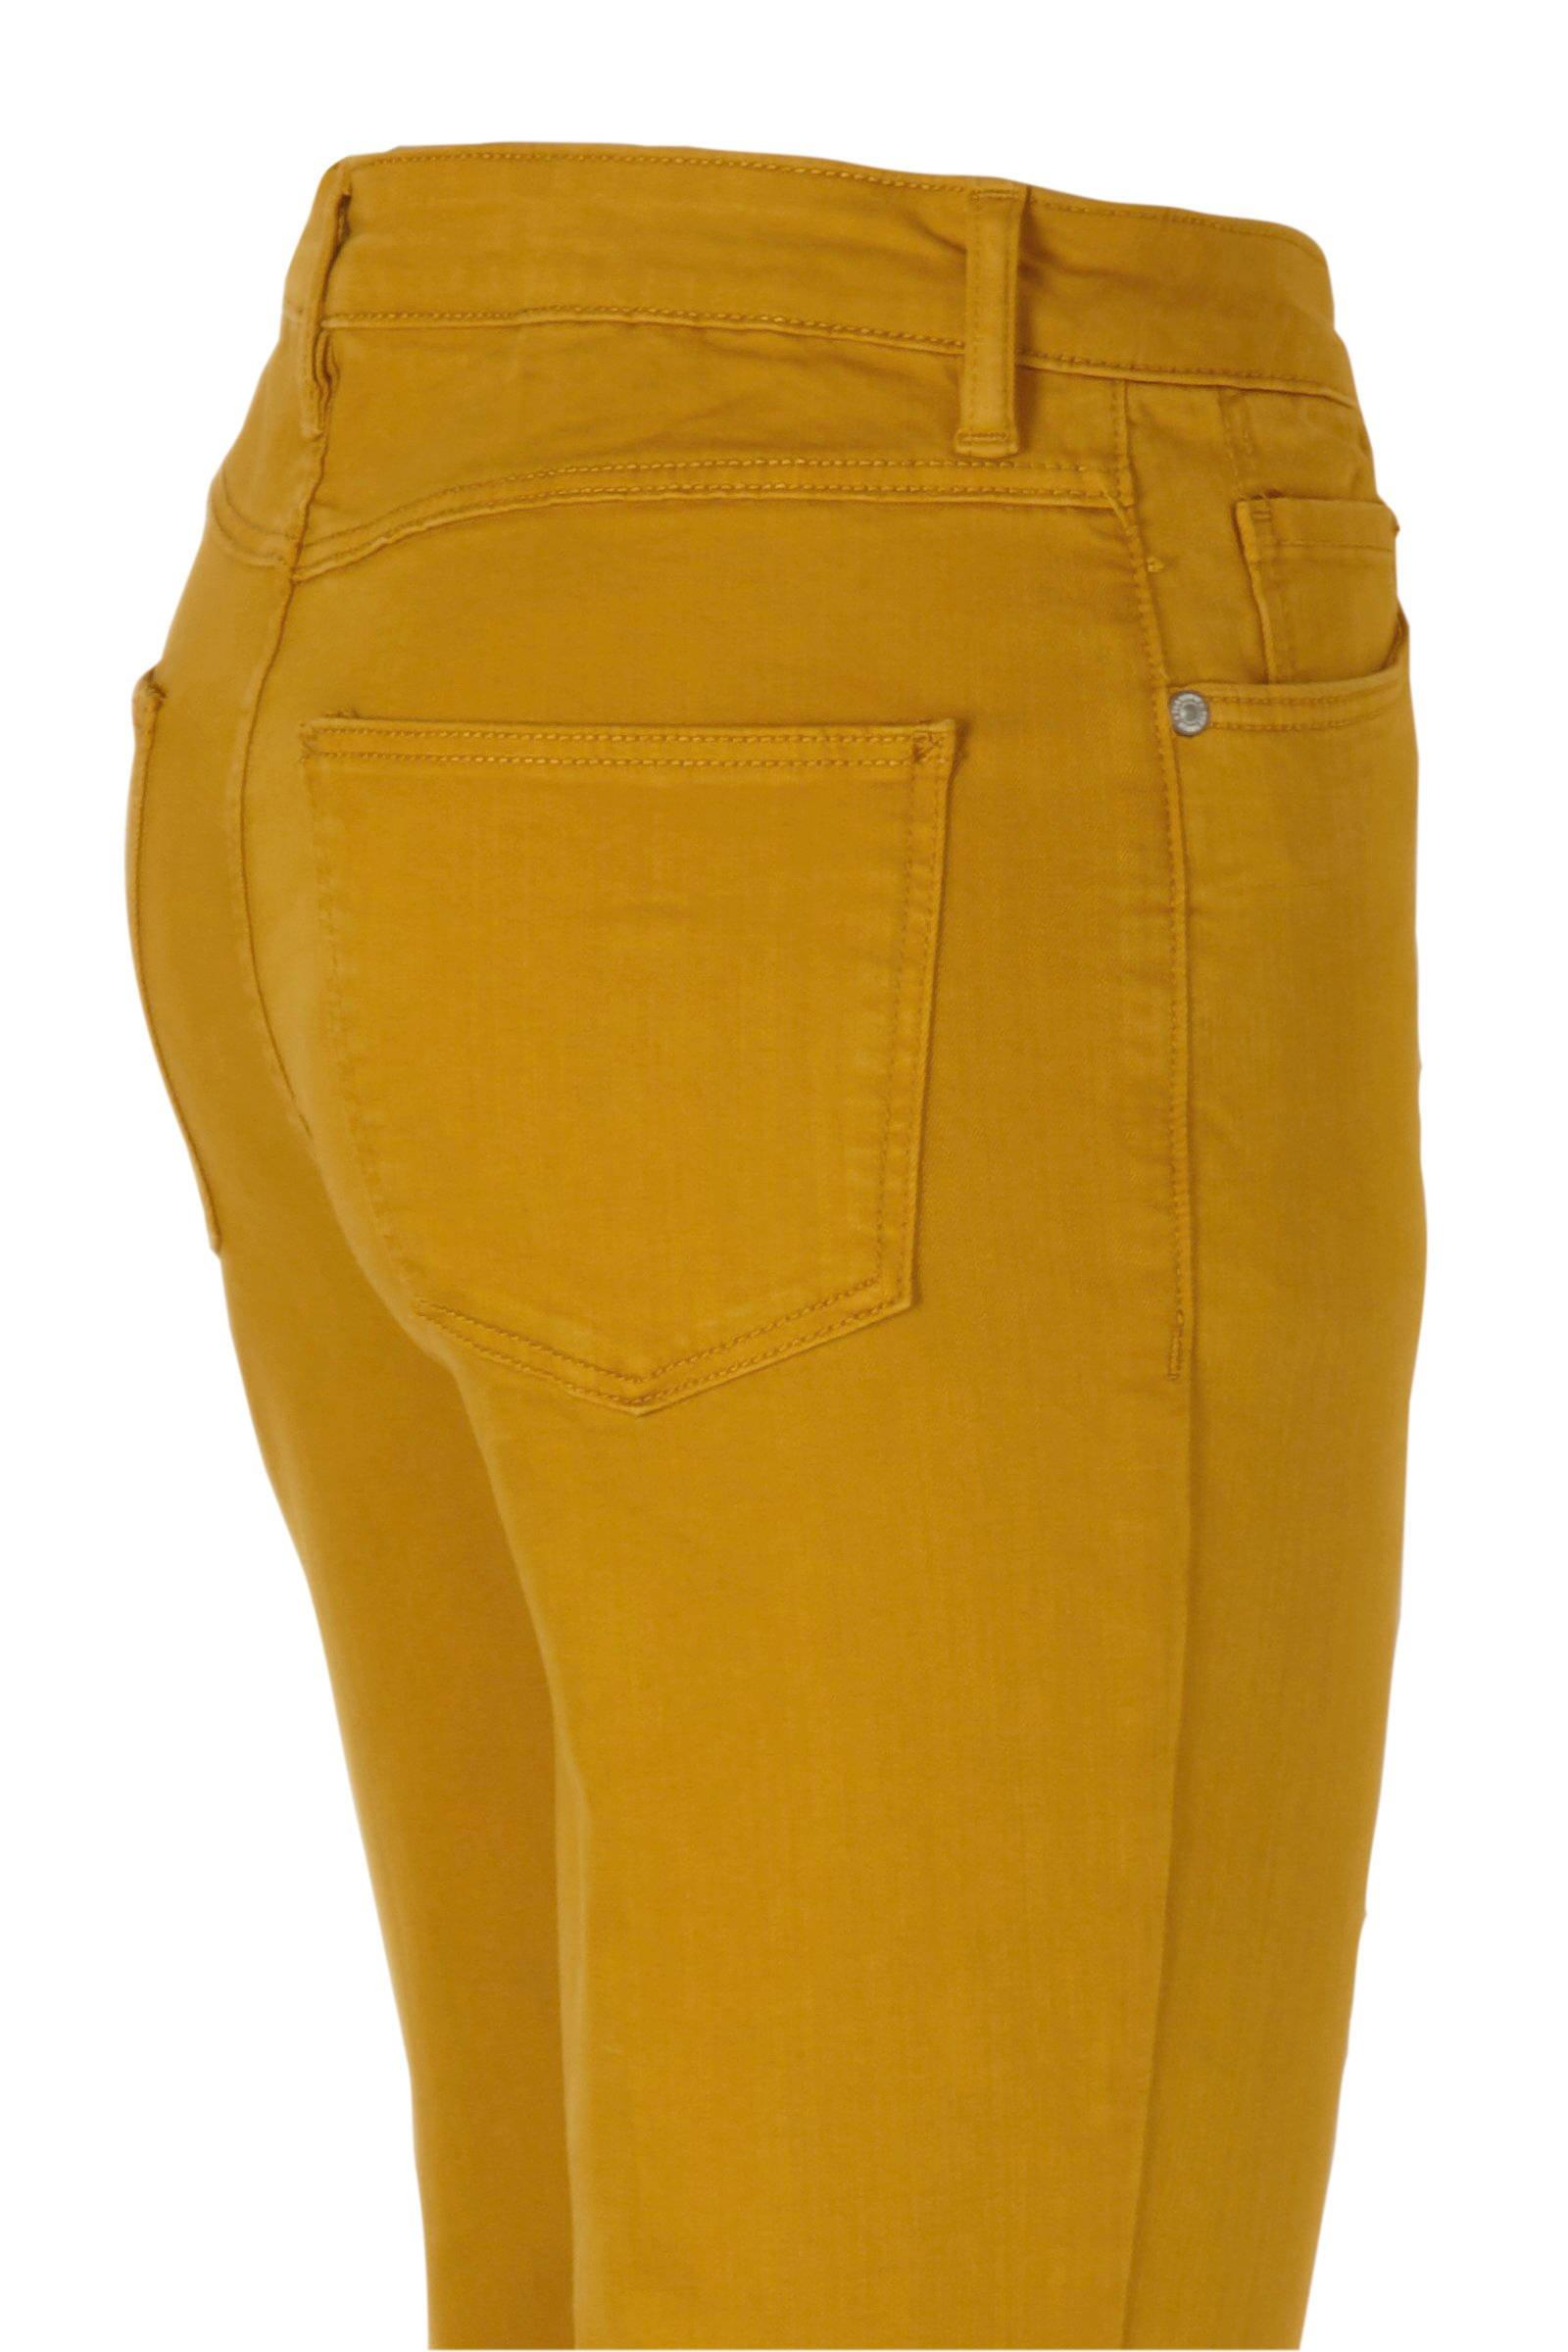 C&A The Denim high waist skinny jeans oker | wehkamp